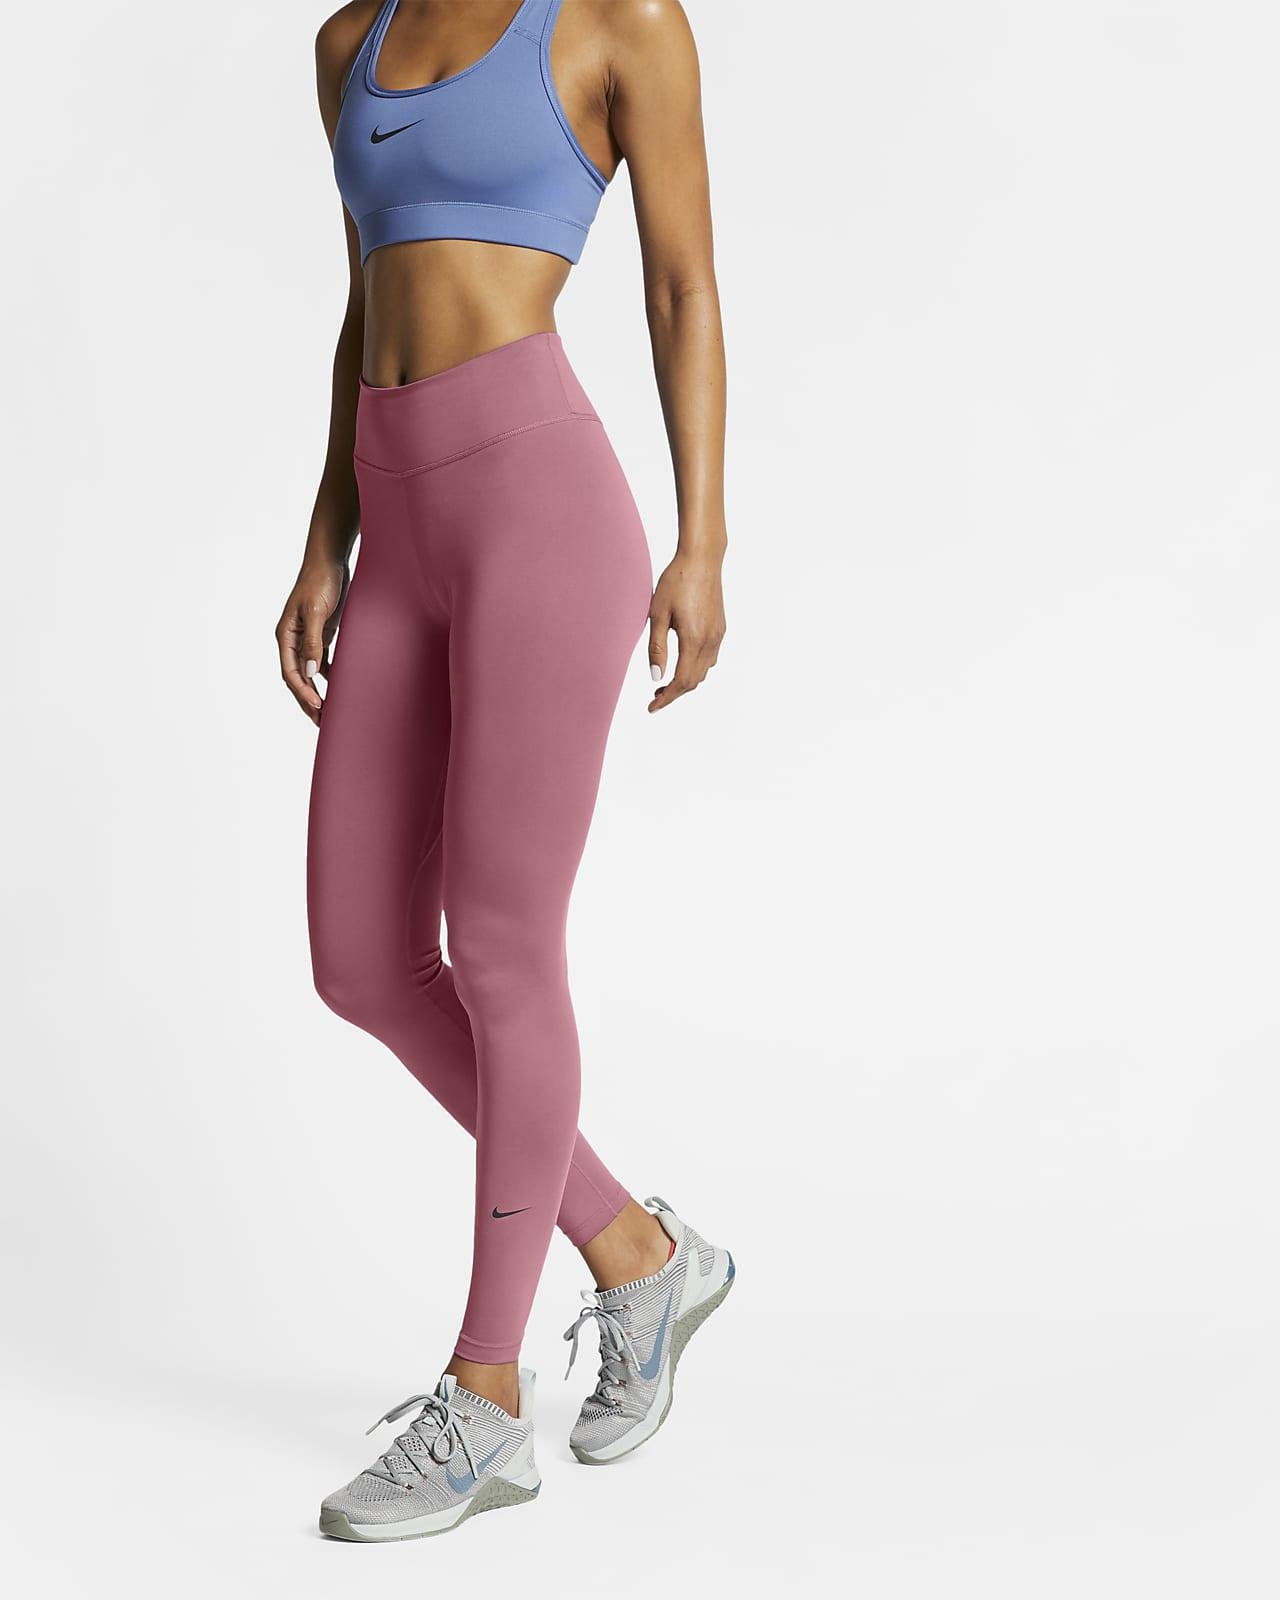 Legging taille mi-basse Nike One pour Femme